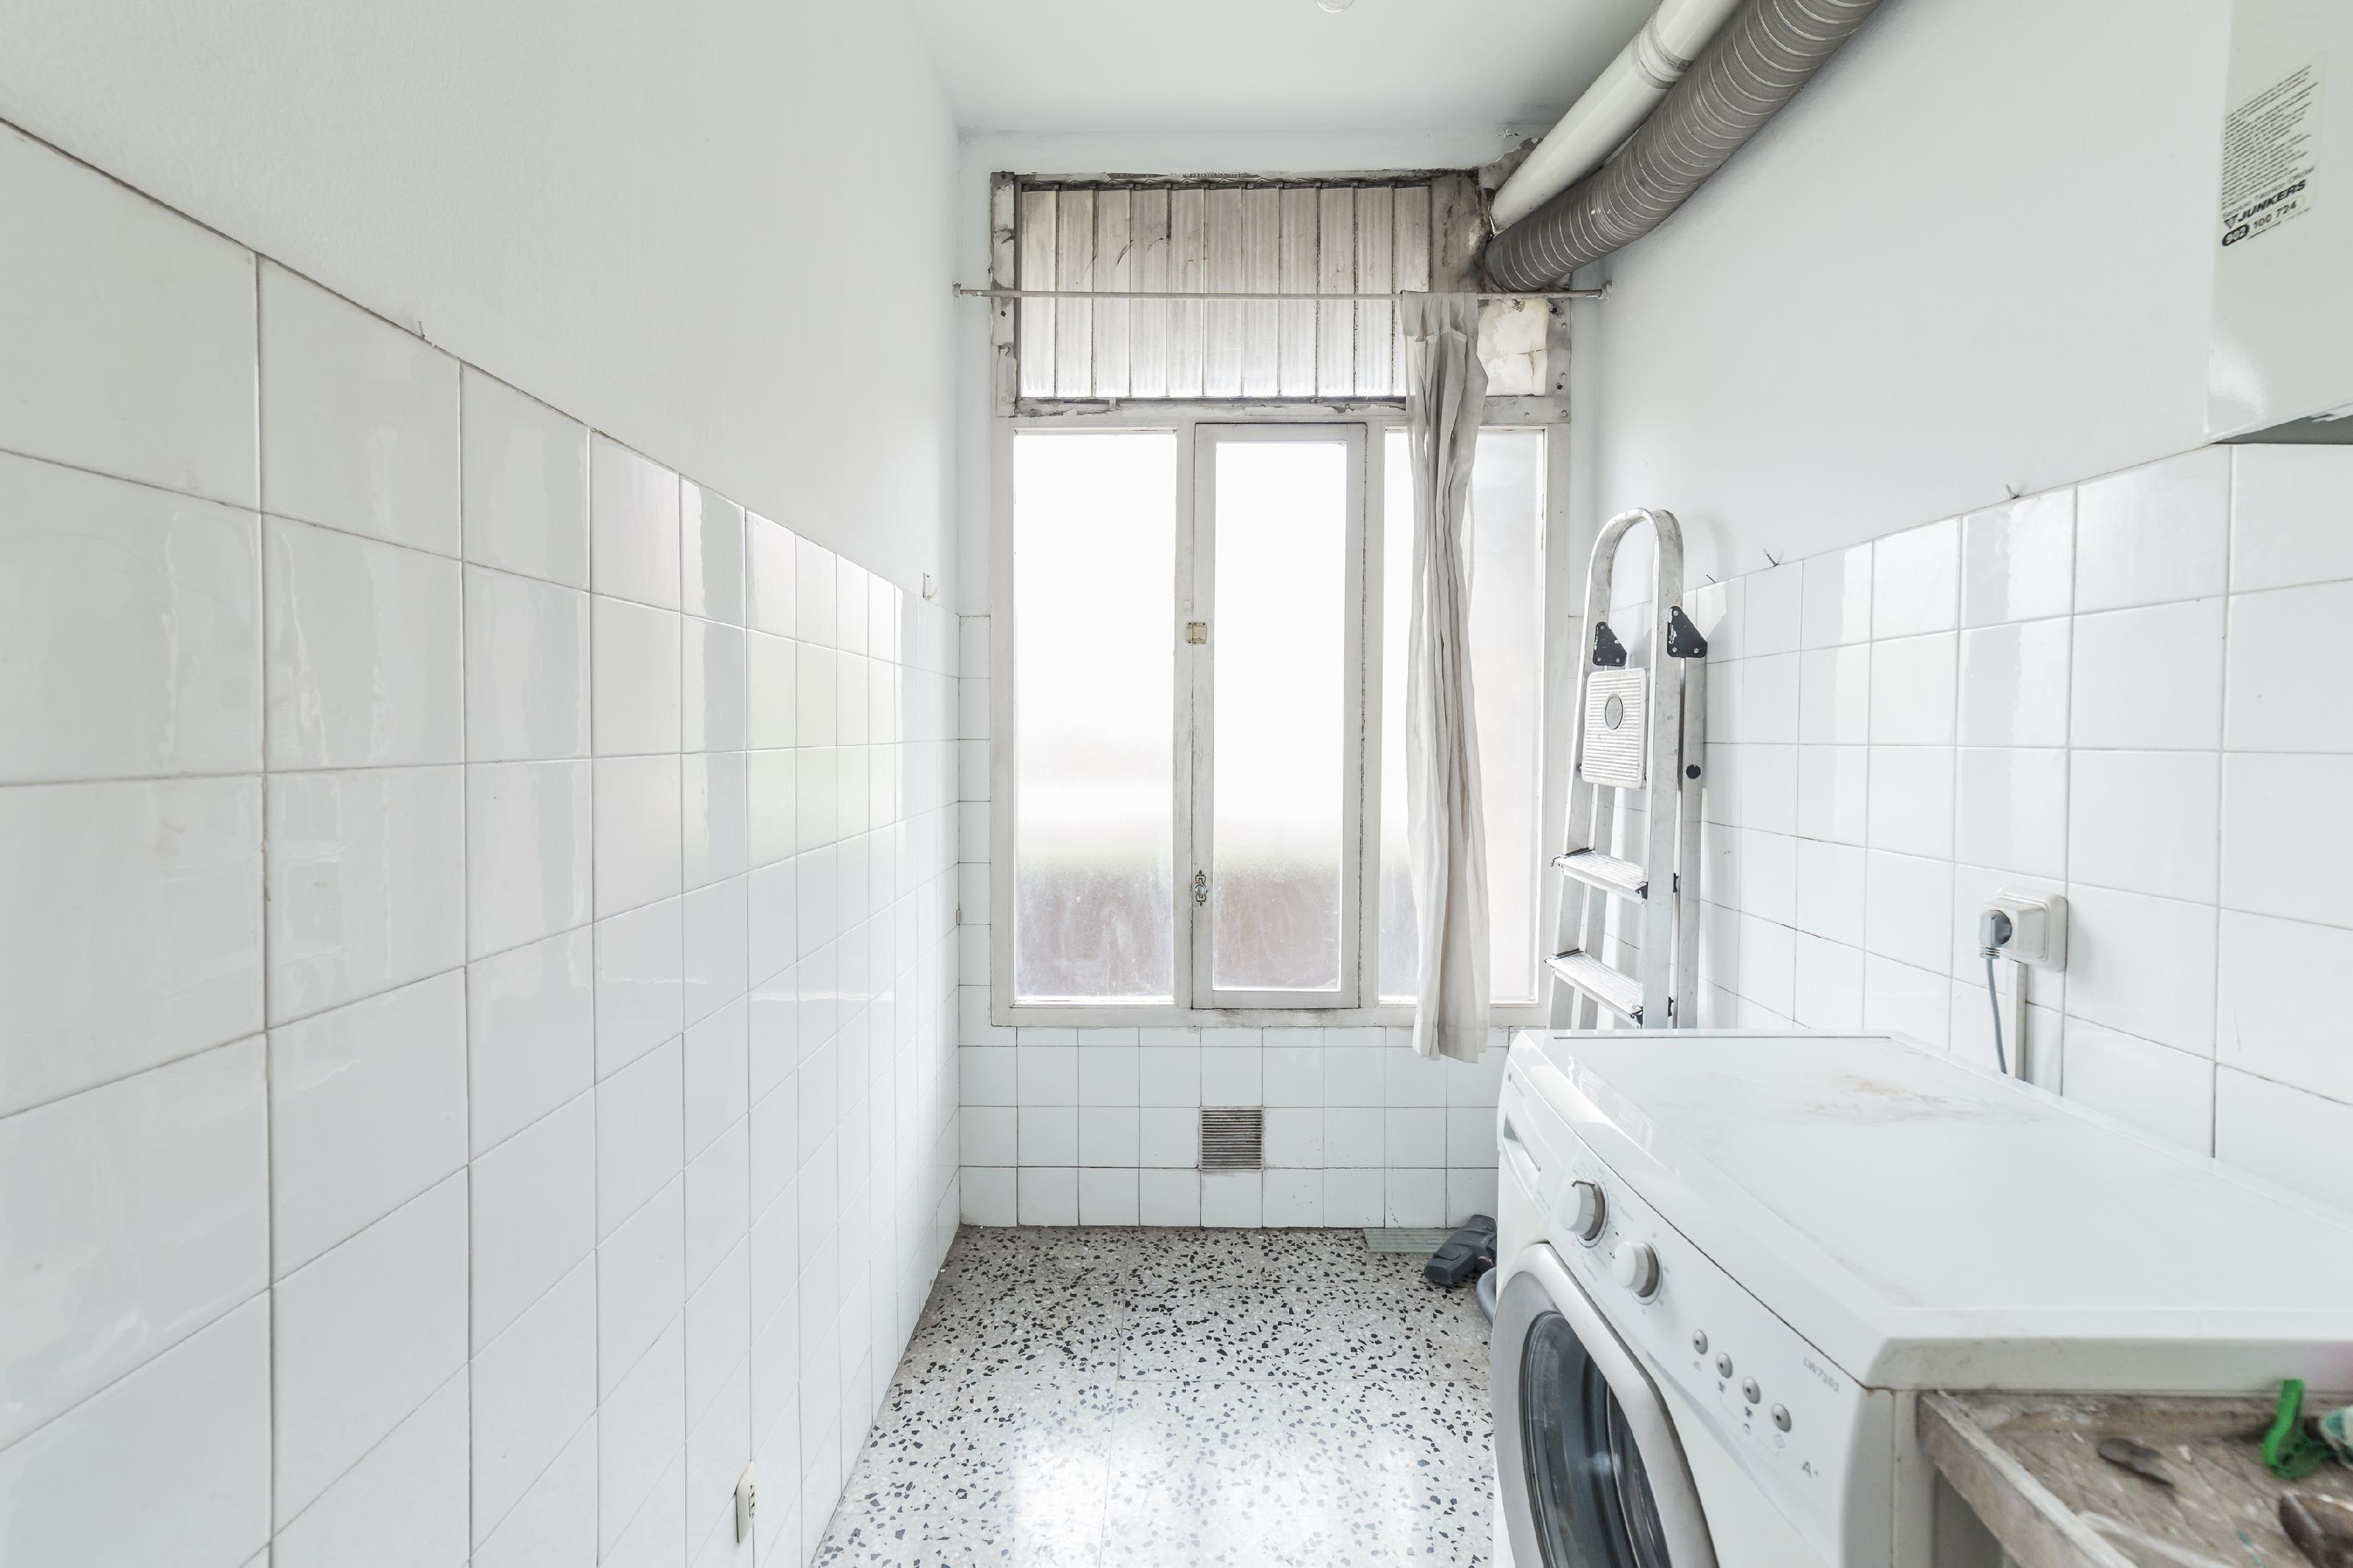 247624 Flat for sale in Eixample, Sant Antoni 13